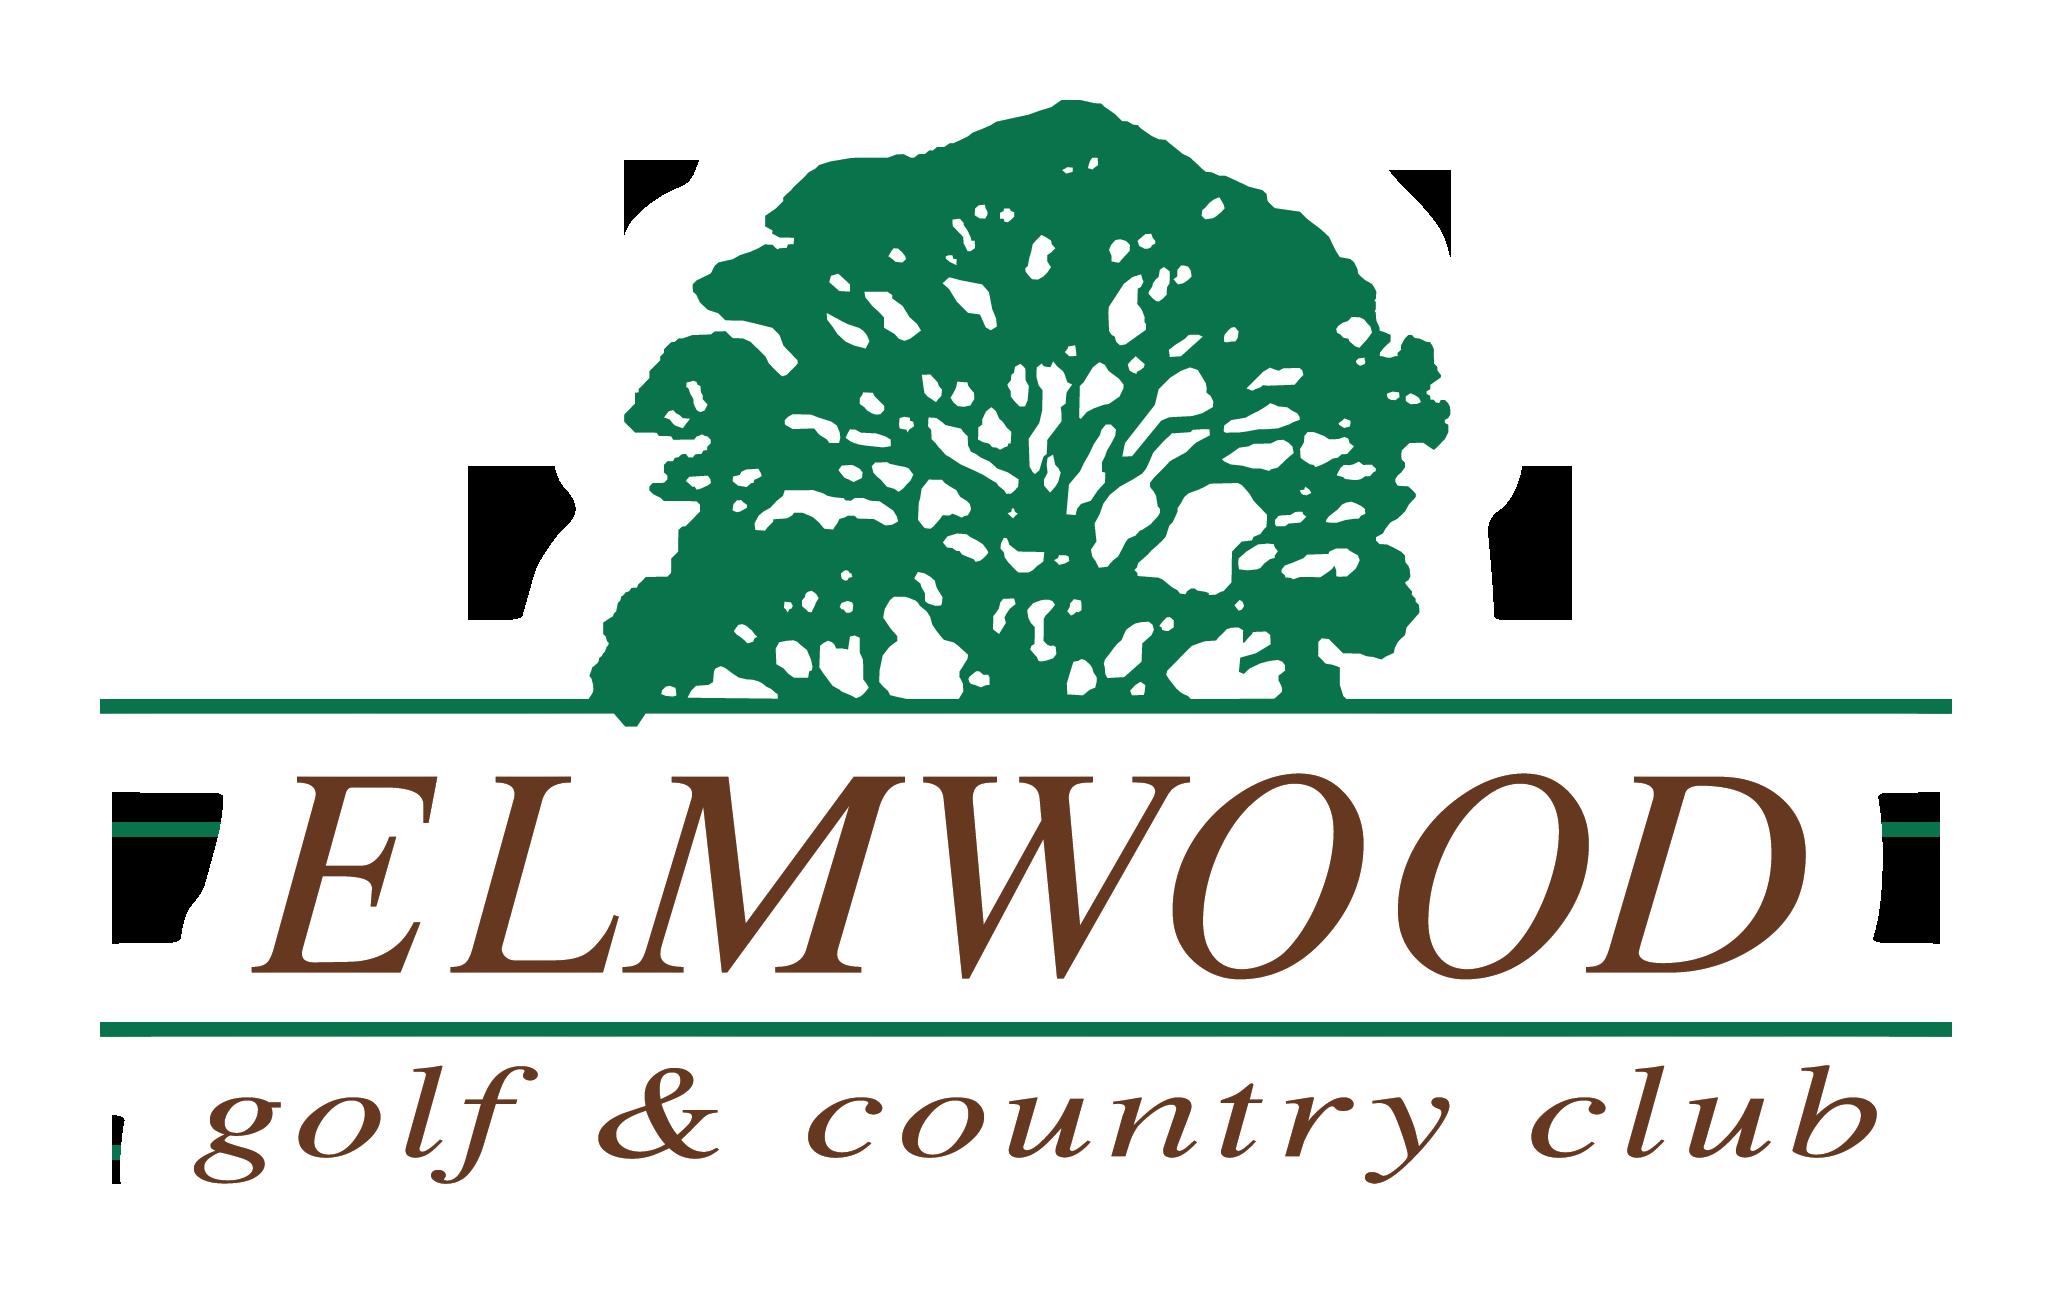 Elmwood Golf & Country